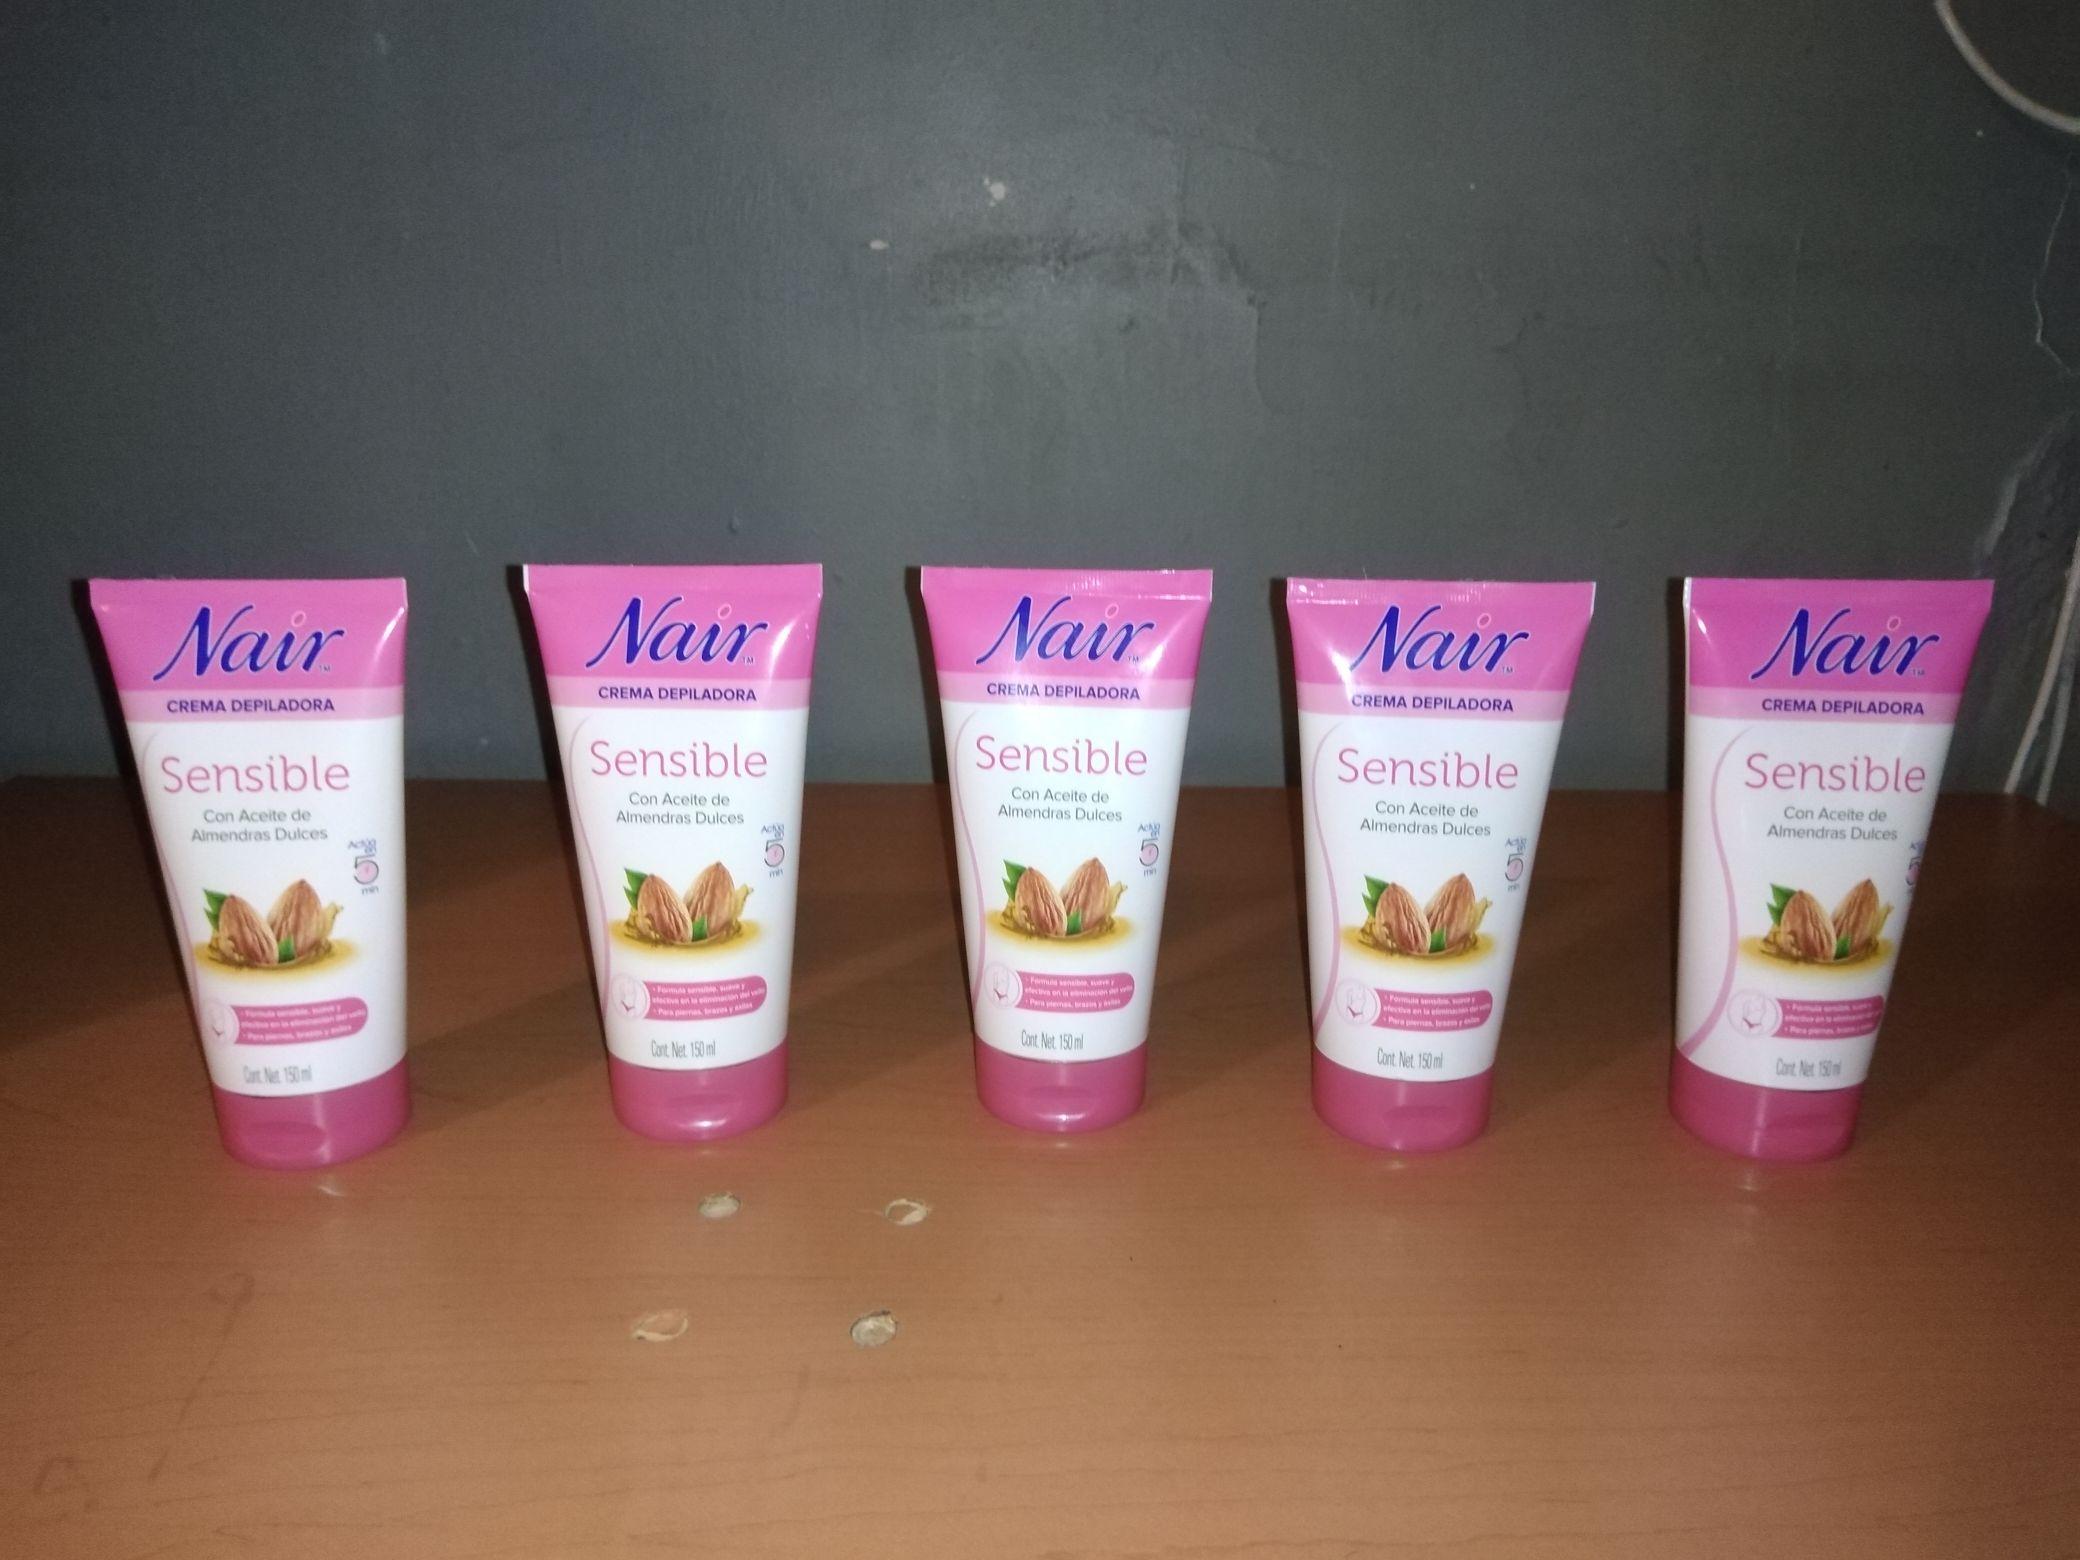 Casa Ley: Crema depiladora Nair para piel sensible con aceite de Almendras Dulces de 150ml